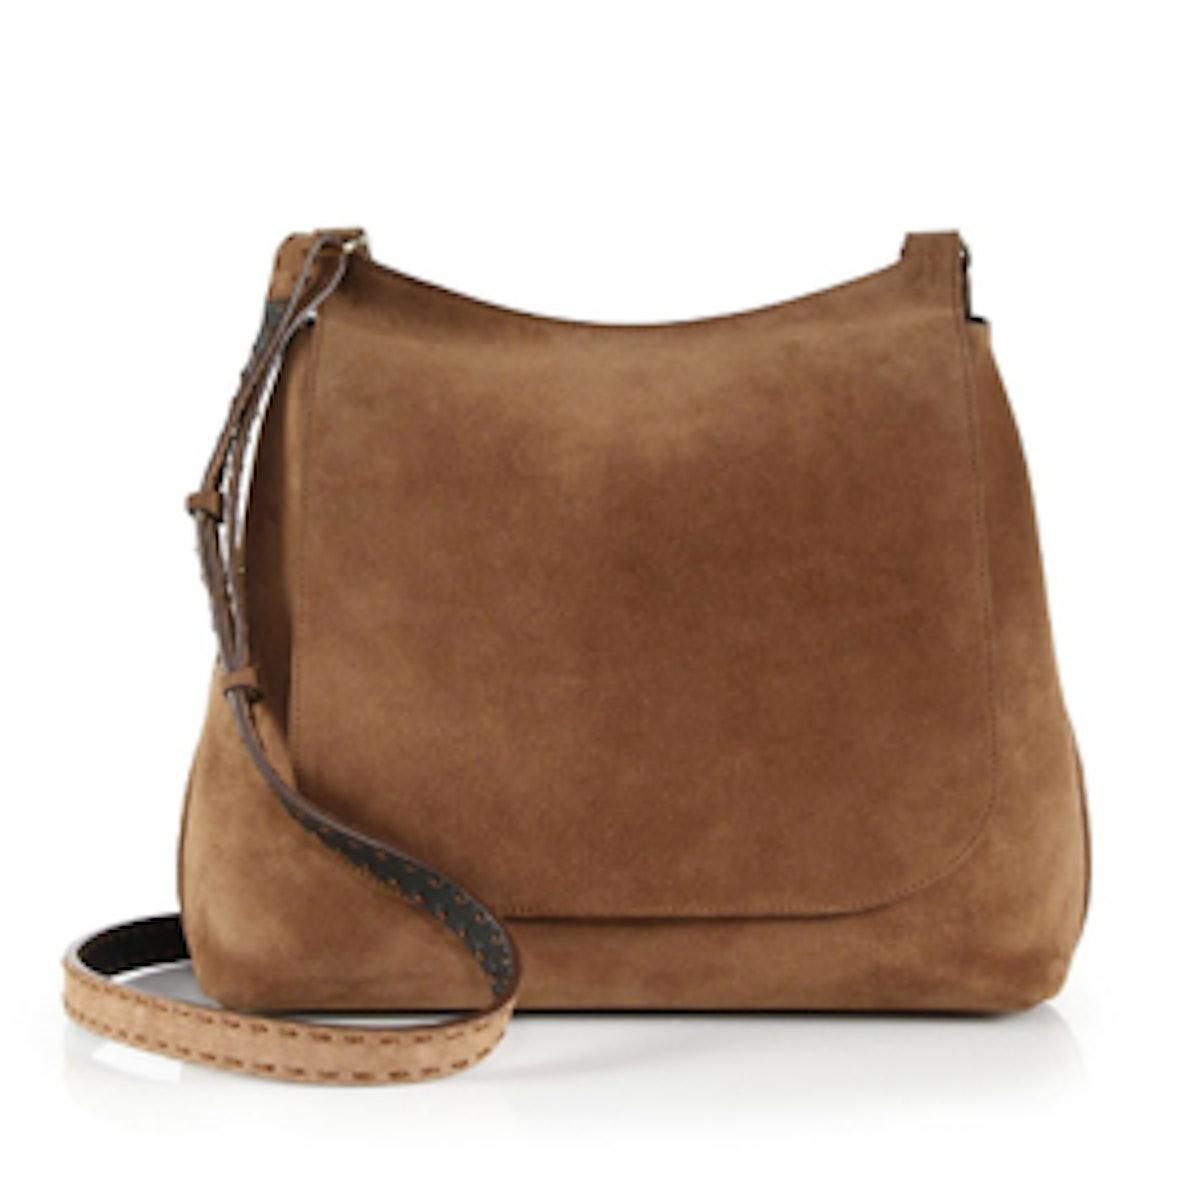 Sideby Suede Bag